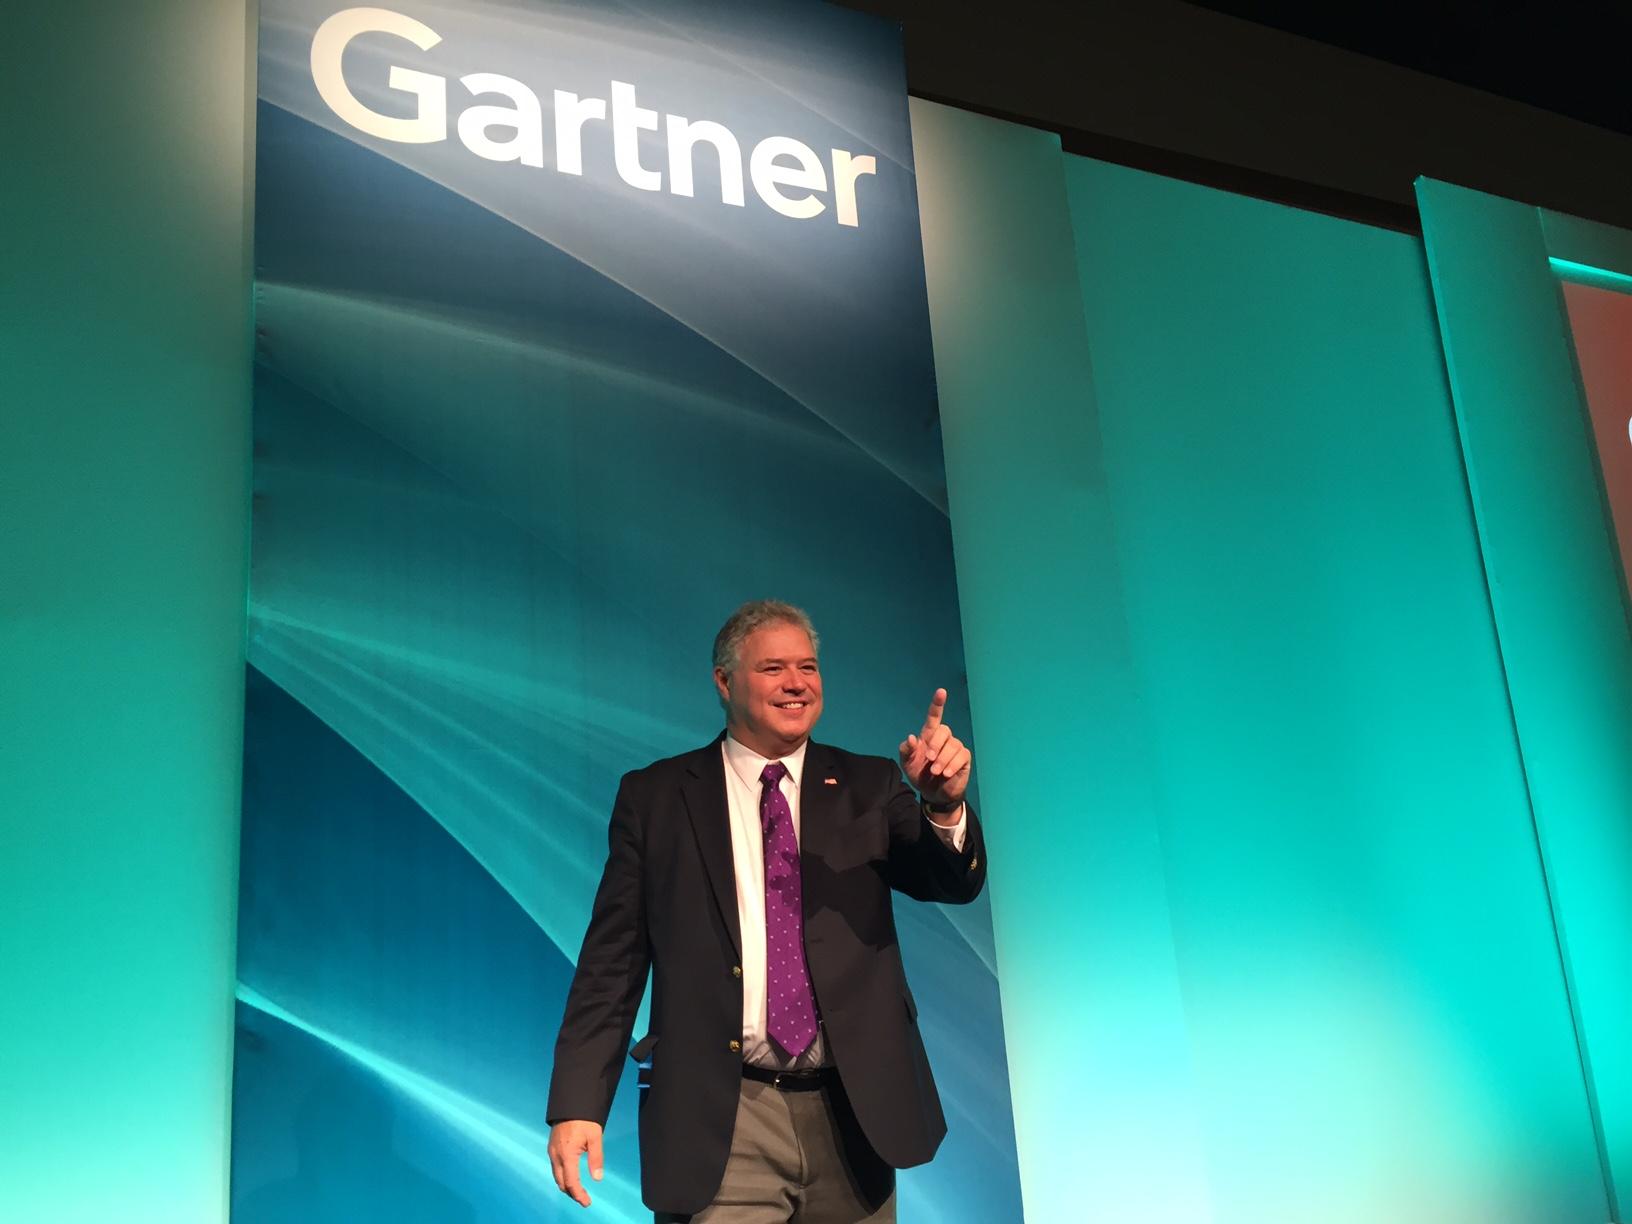 Gartner's Gene Alvarez discusses how organizations will need to adapt their customer experiences over the next 5 years during the Gartner Customer 360 Summit.